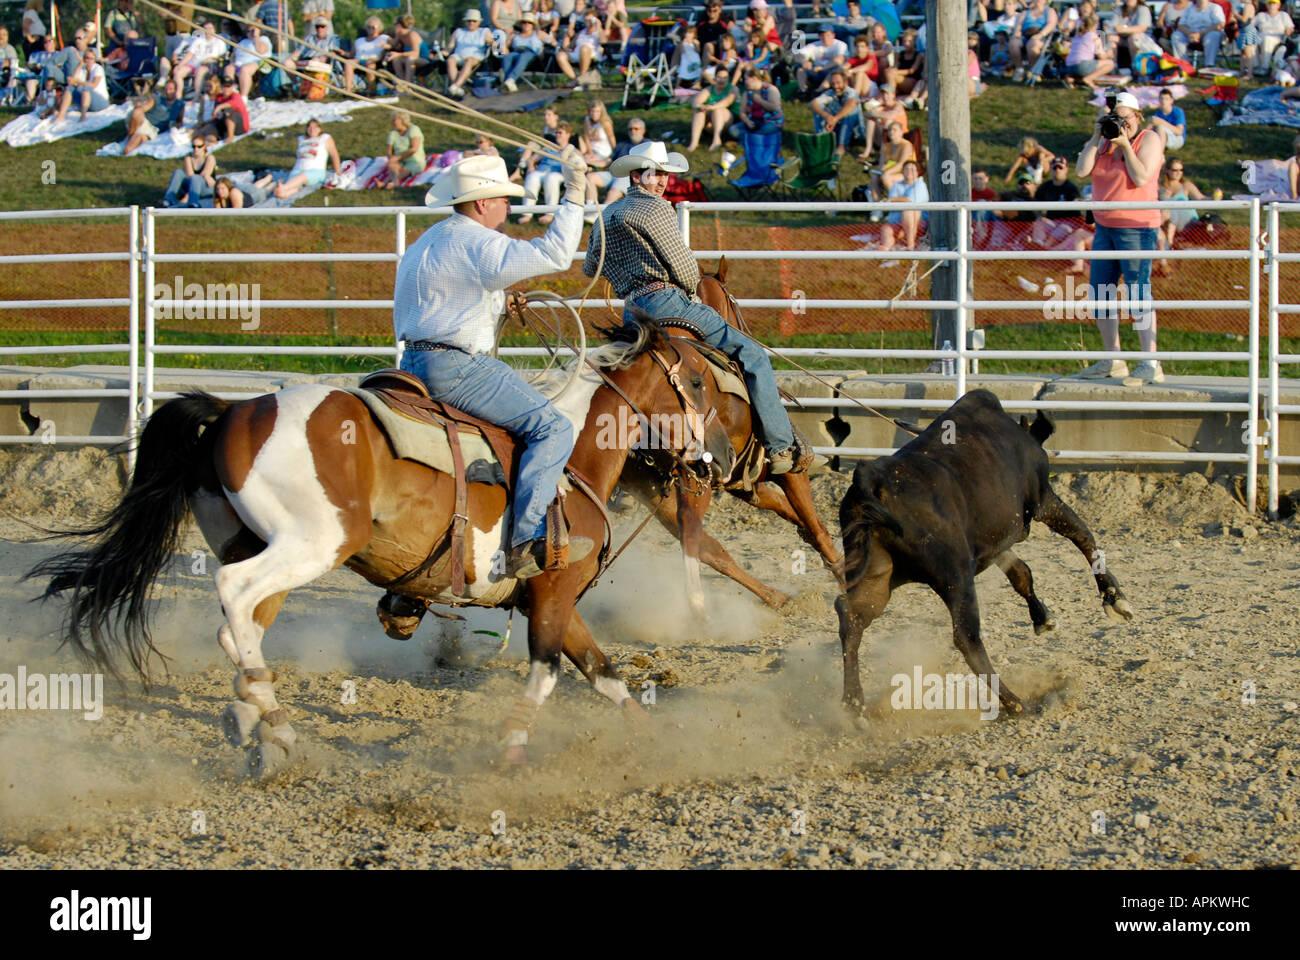 Cowboys teilnehmen im Rodeo Kalb roping event Stockbild